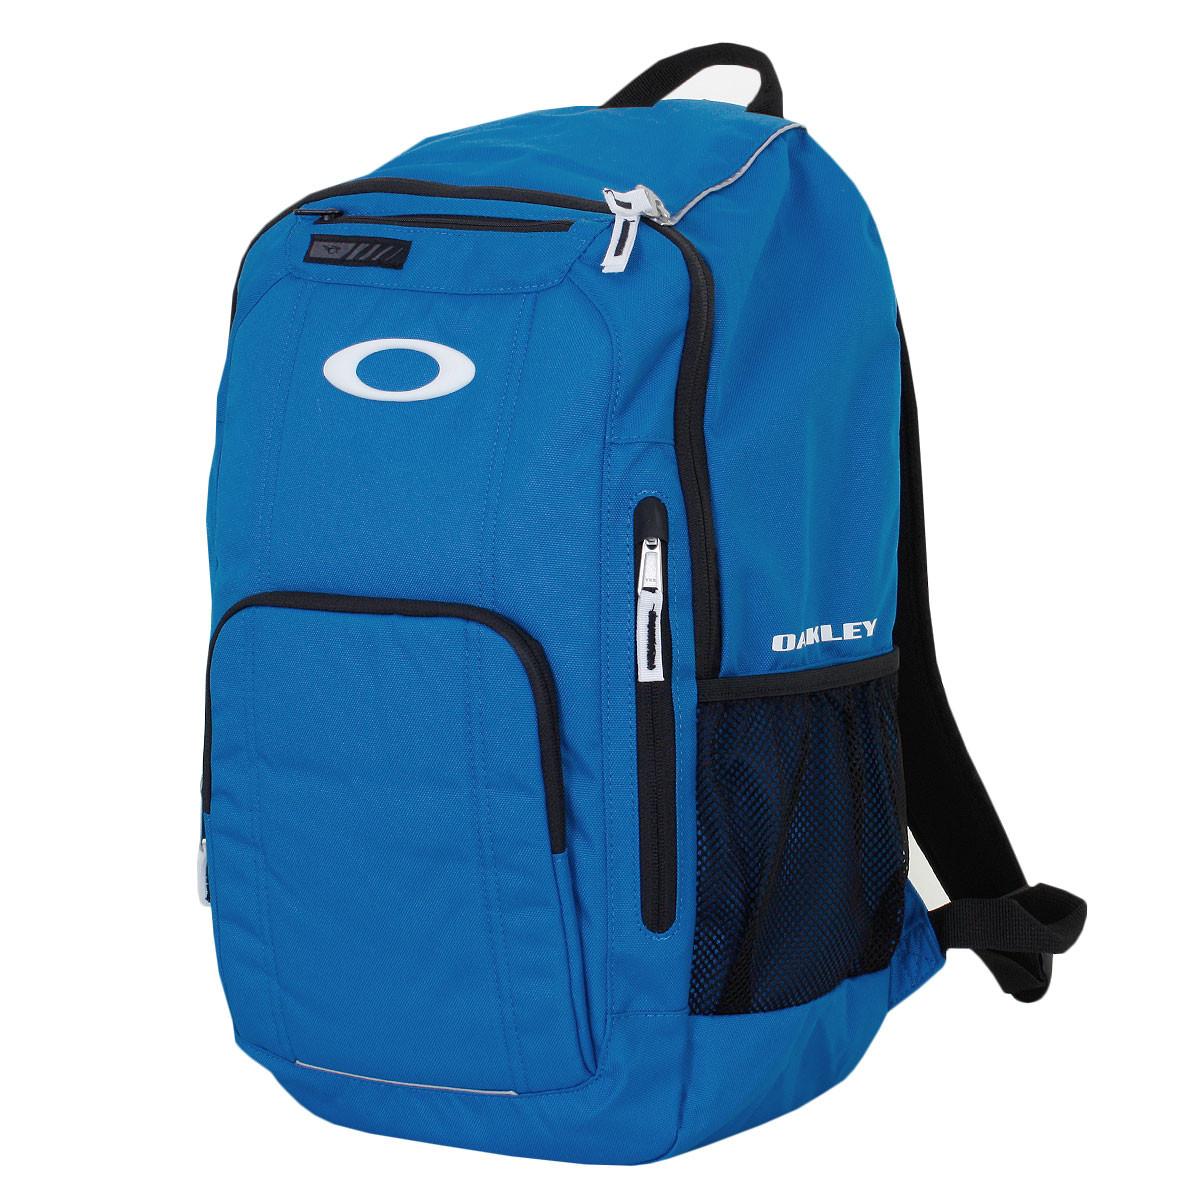 6a624d841a4 Oakley Unisex Enduro 25L 2.0 Backpack